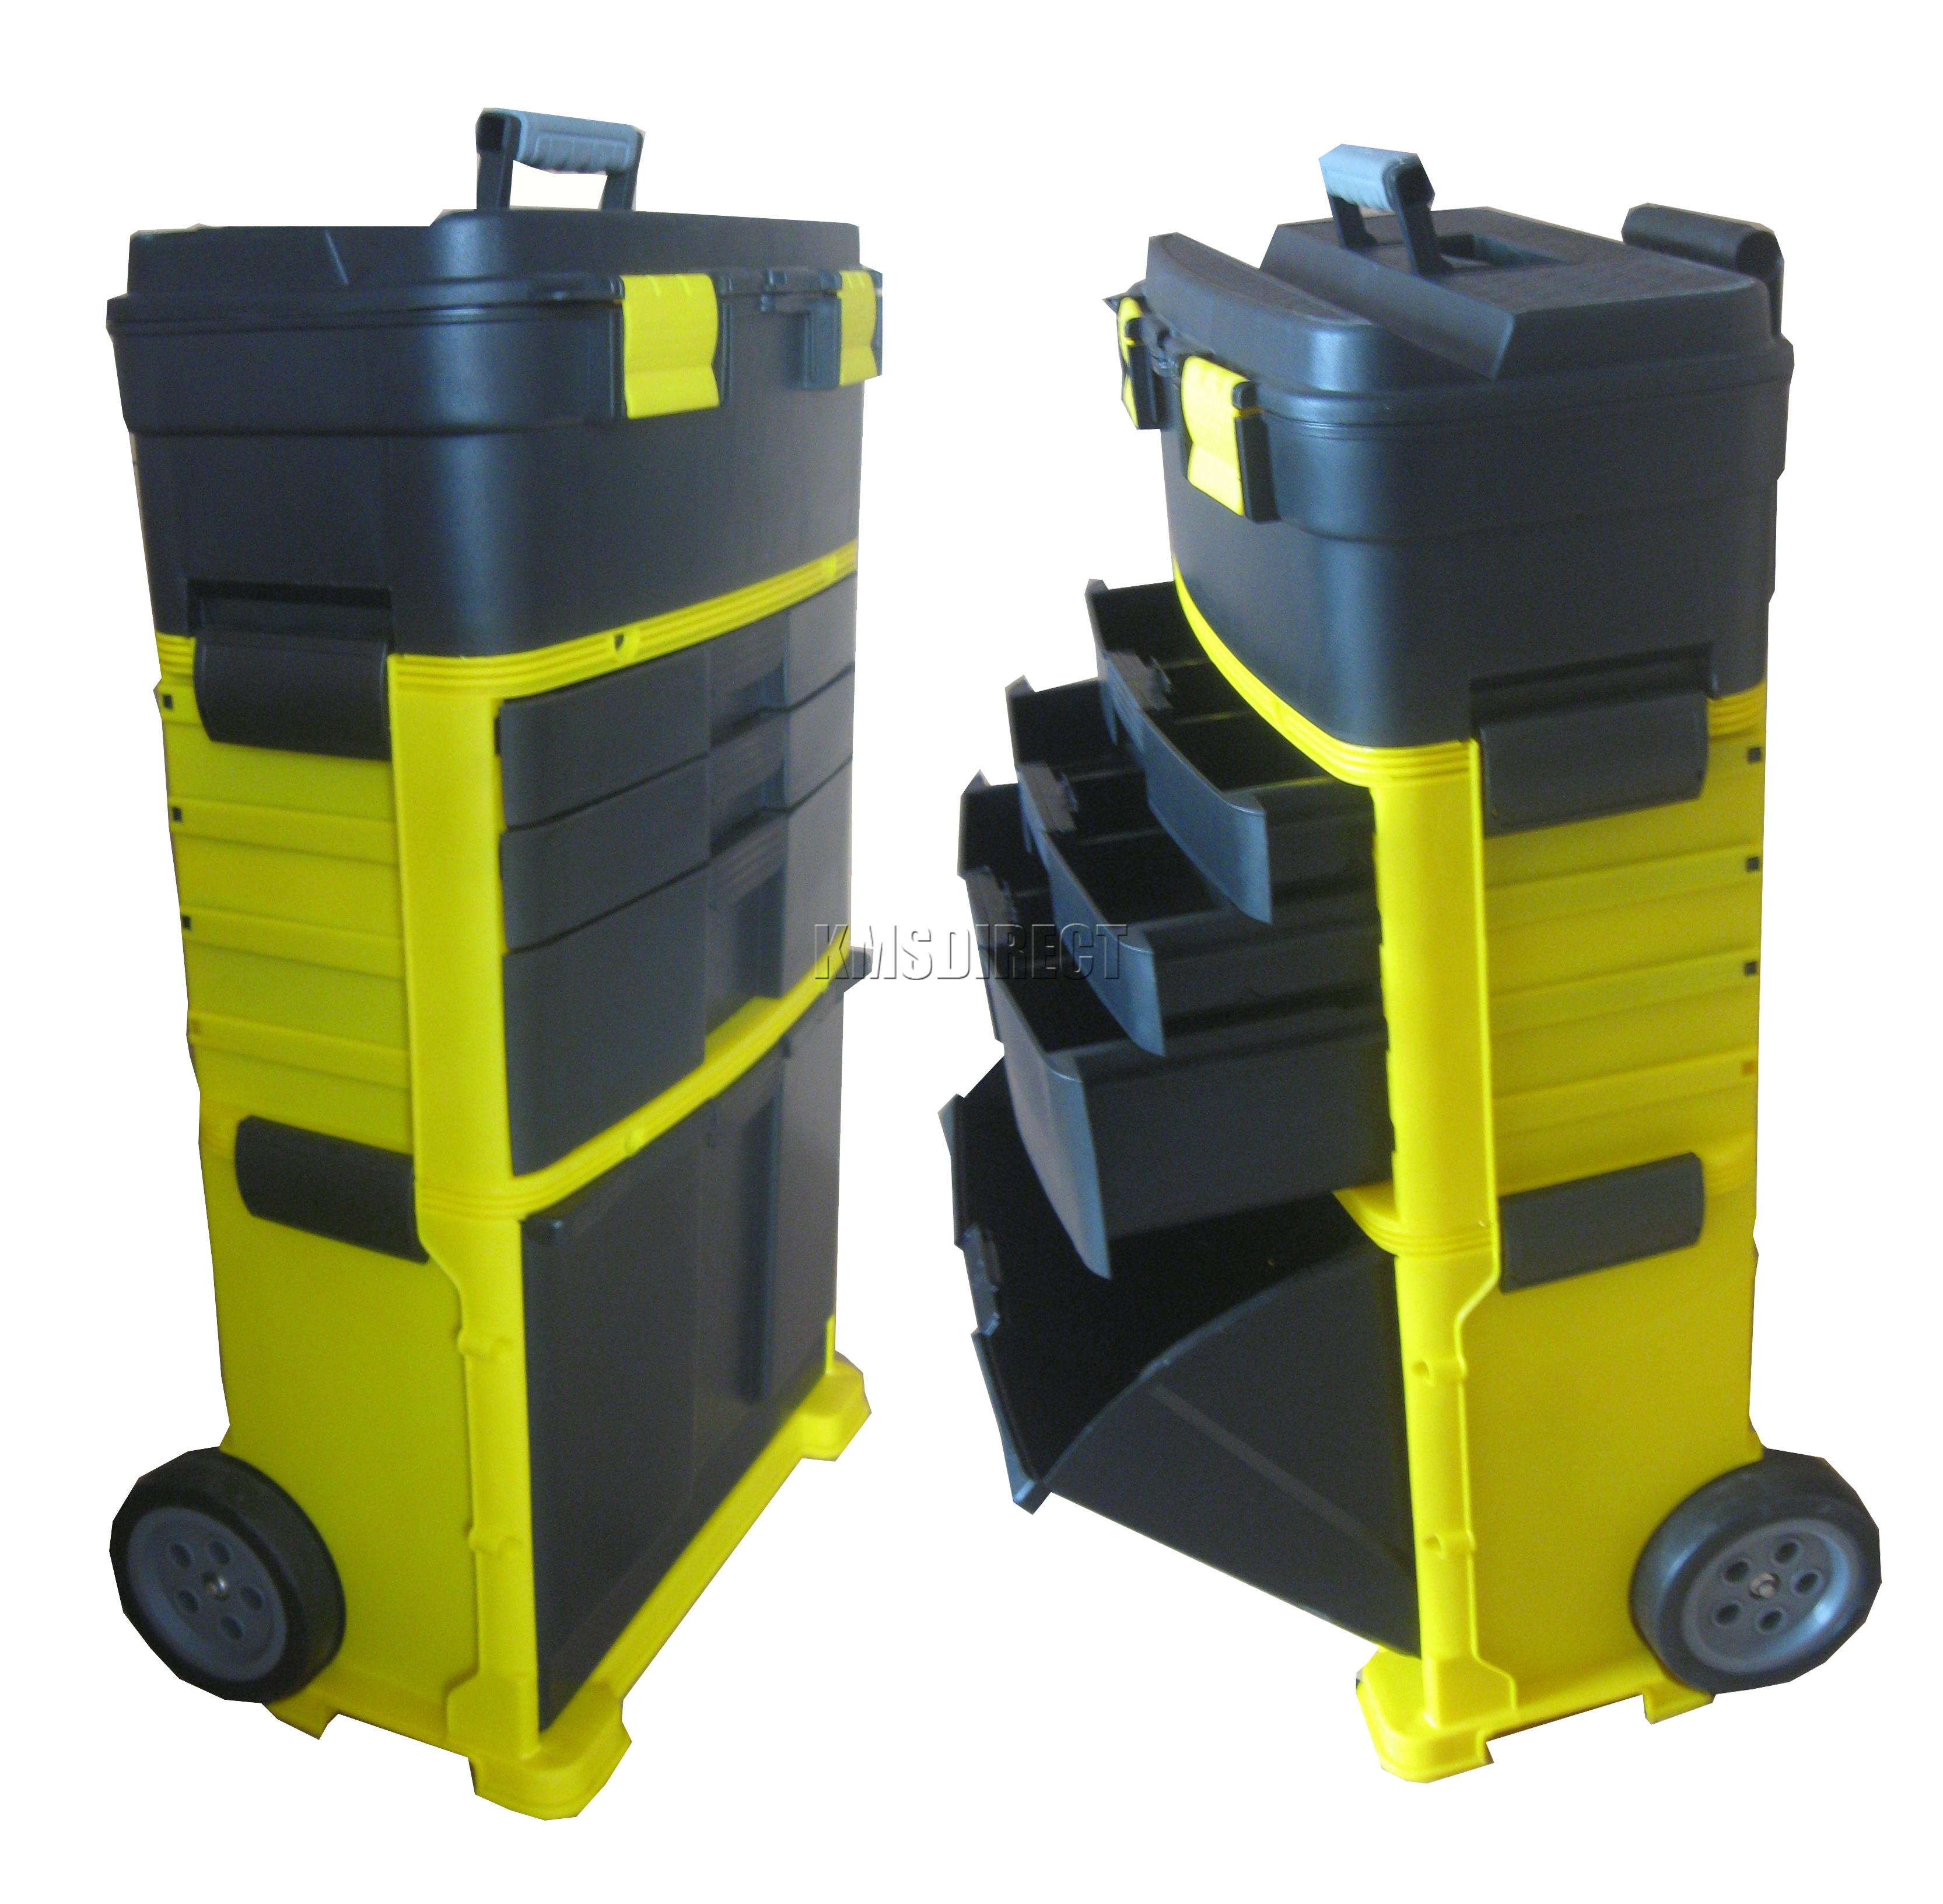 Foxhunter Mobile Roller Workshop Chest Trolley Storage